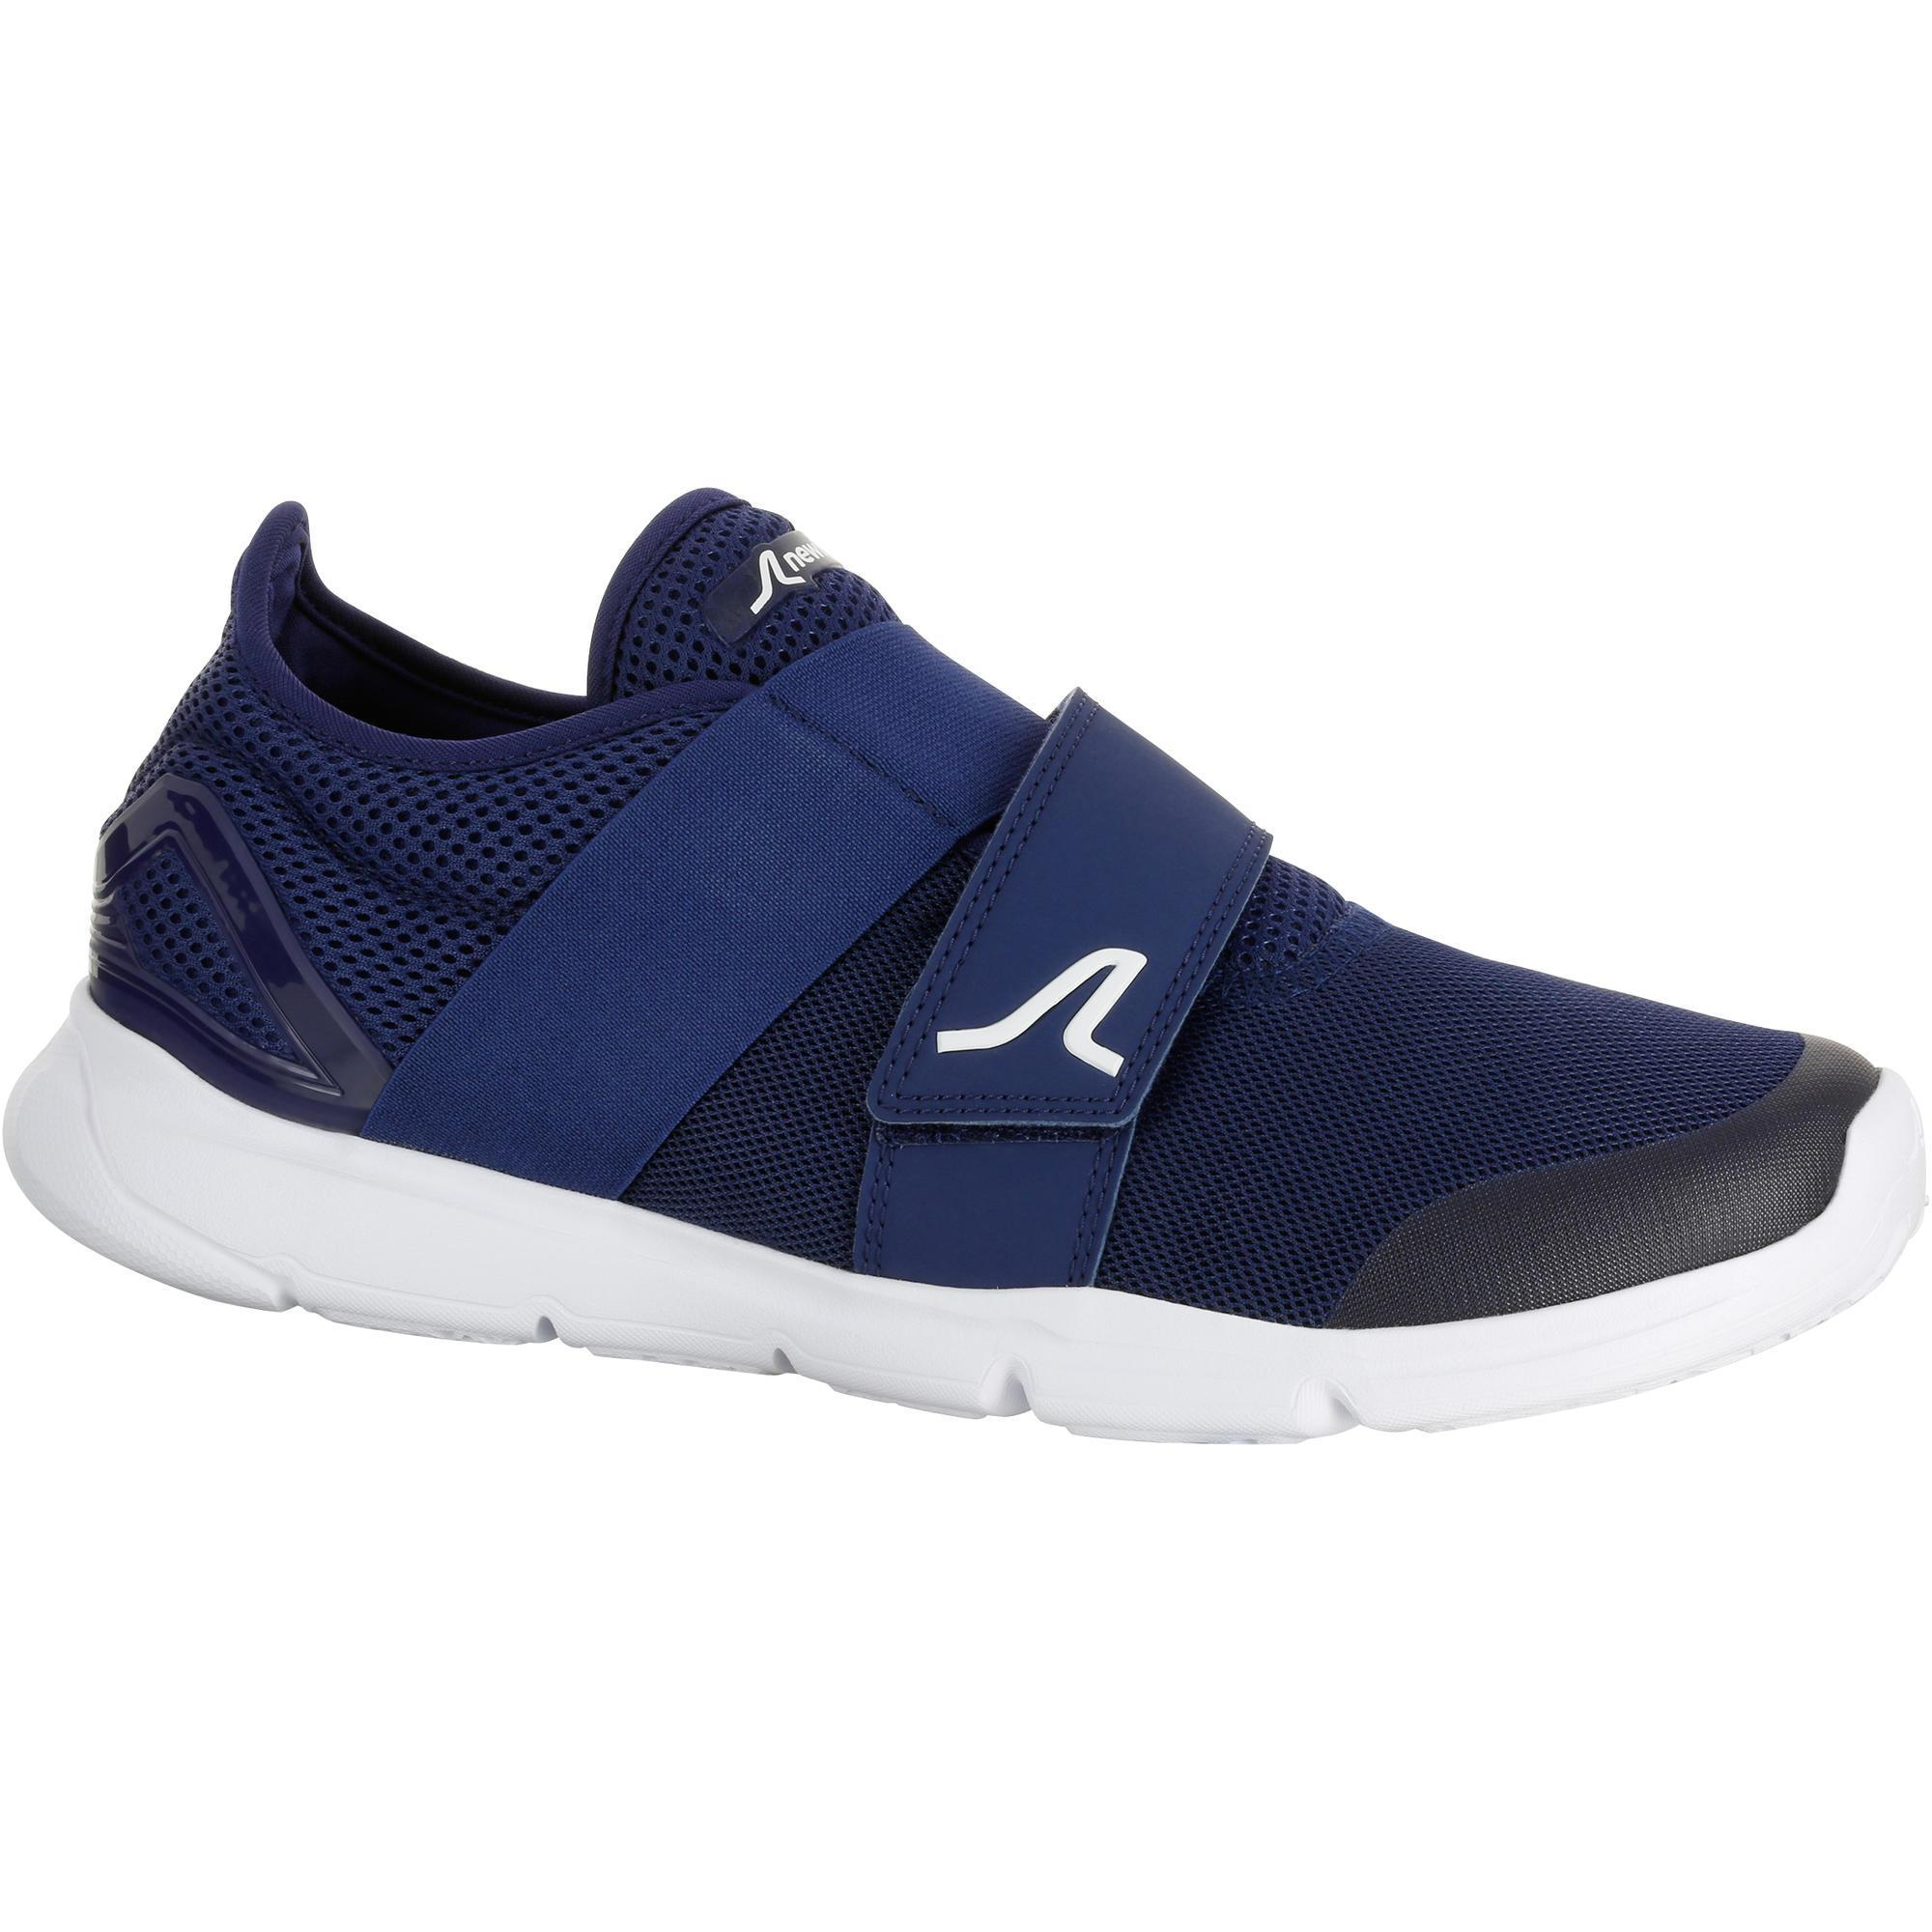 chaussures marche sportive homme soft 180 strap bleu blanc newfeel. Black Bedroom Furniture Sets. Home Design Ideas